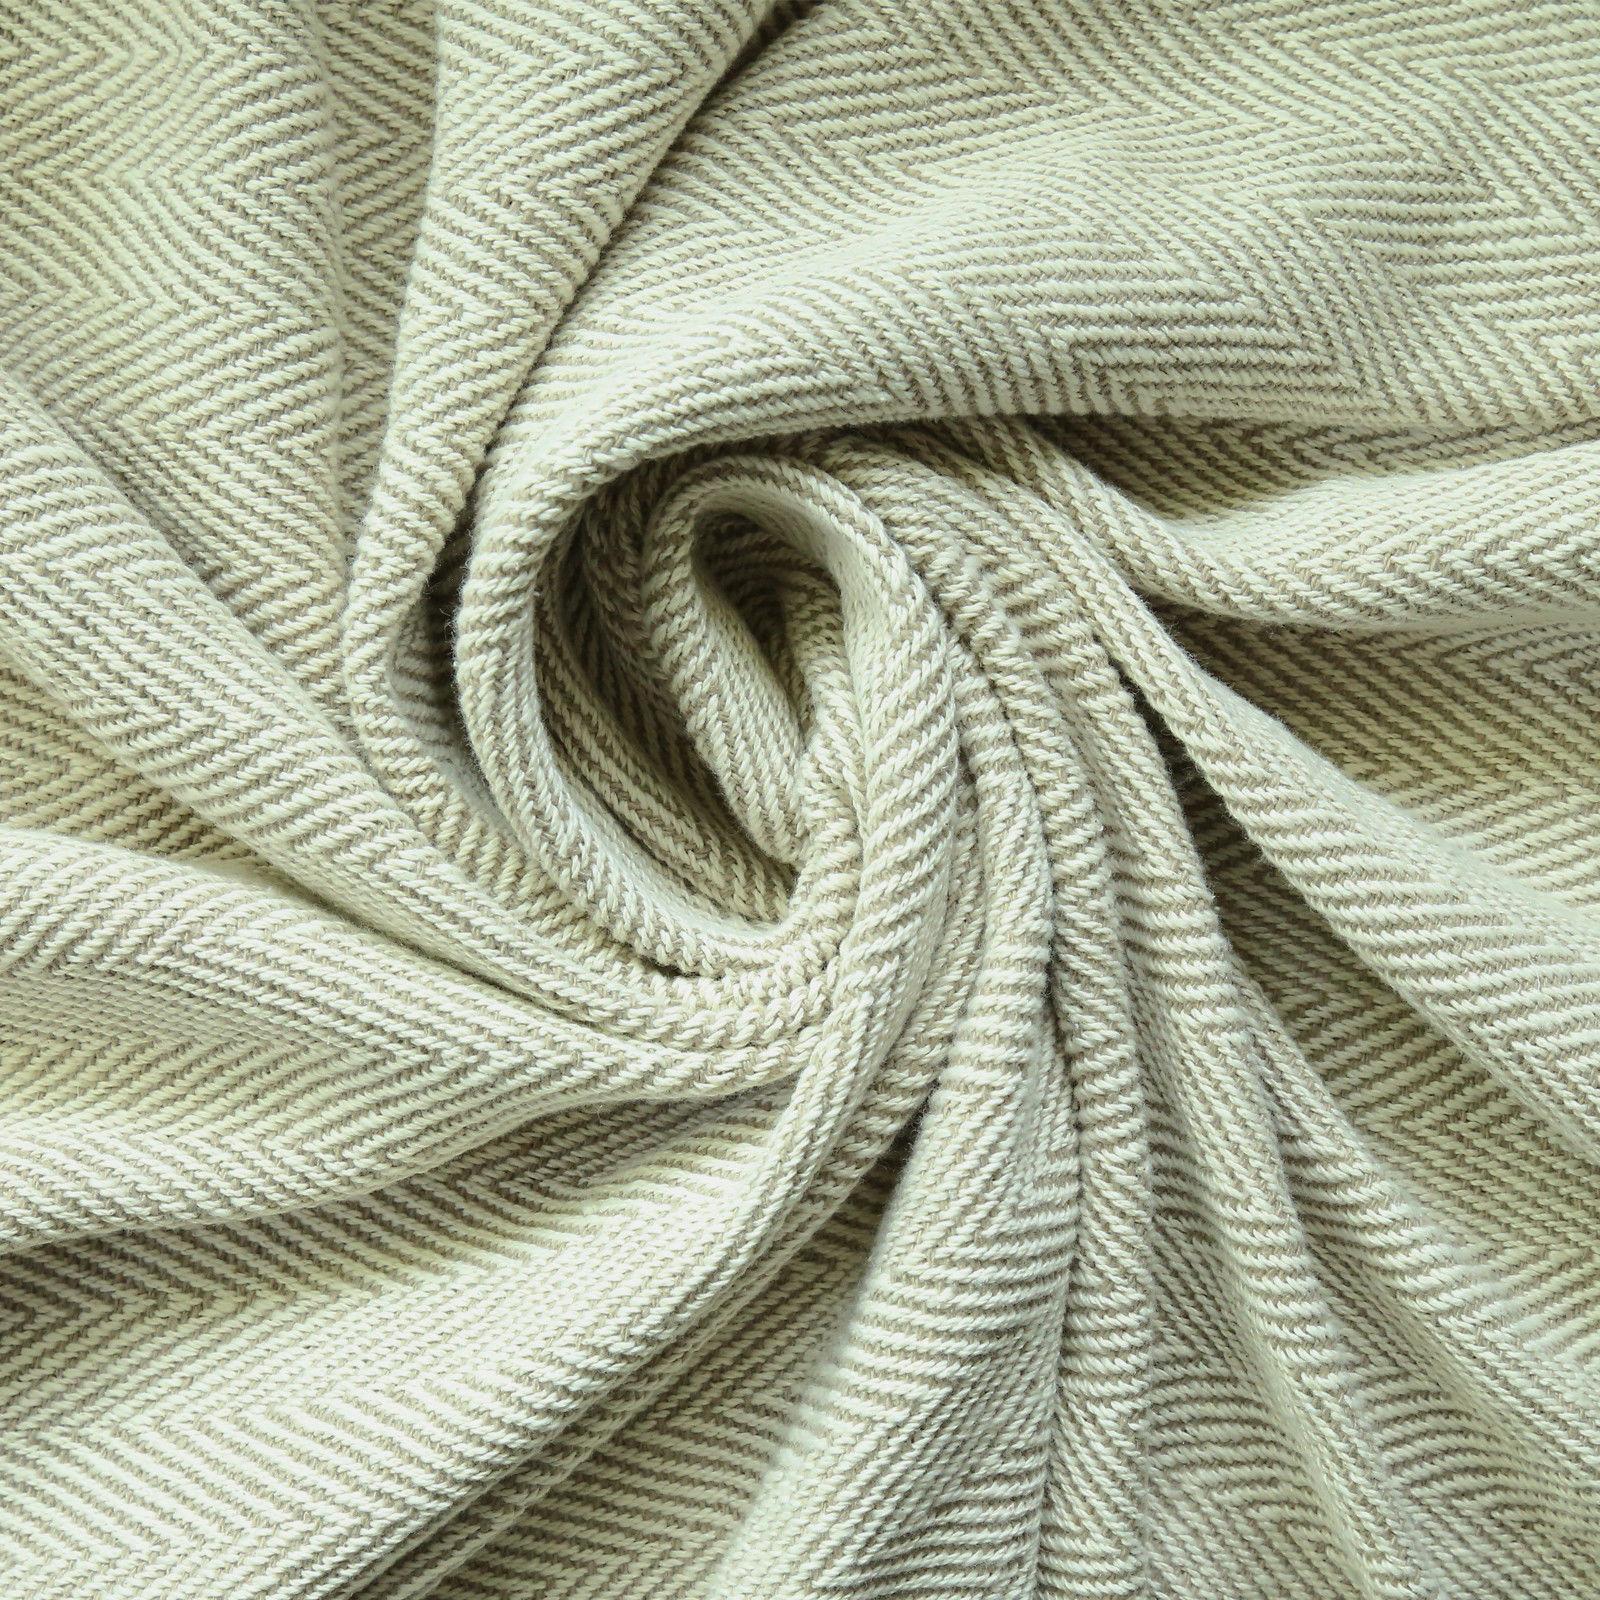 Cotton Tassel Throw Woven Soft Warm Reversible Throw Blanket